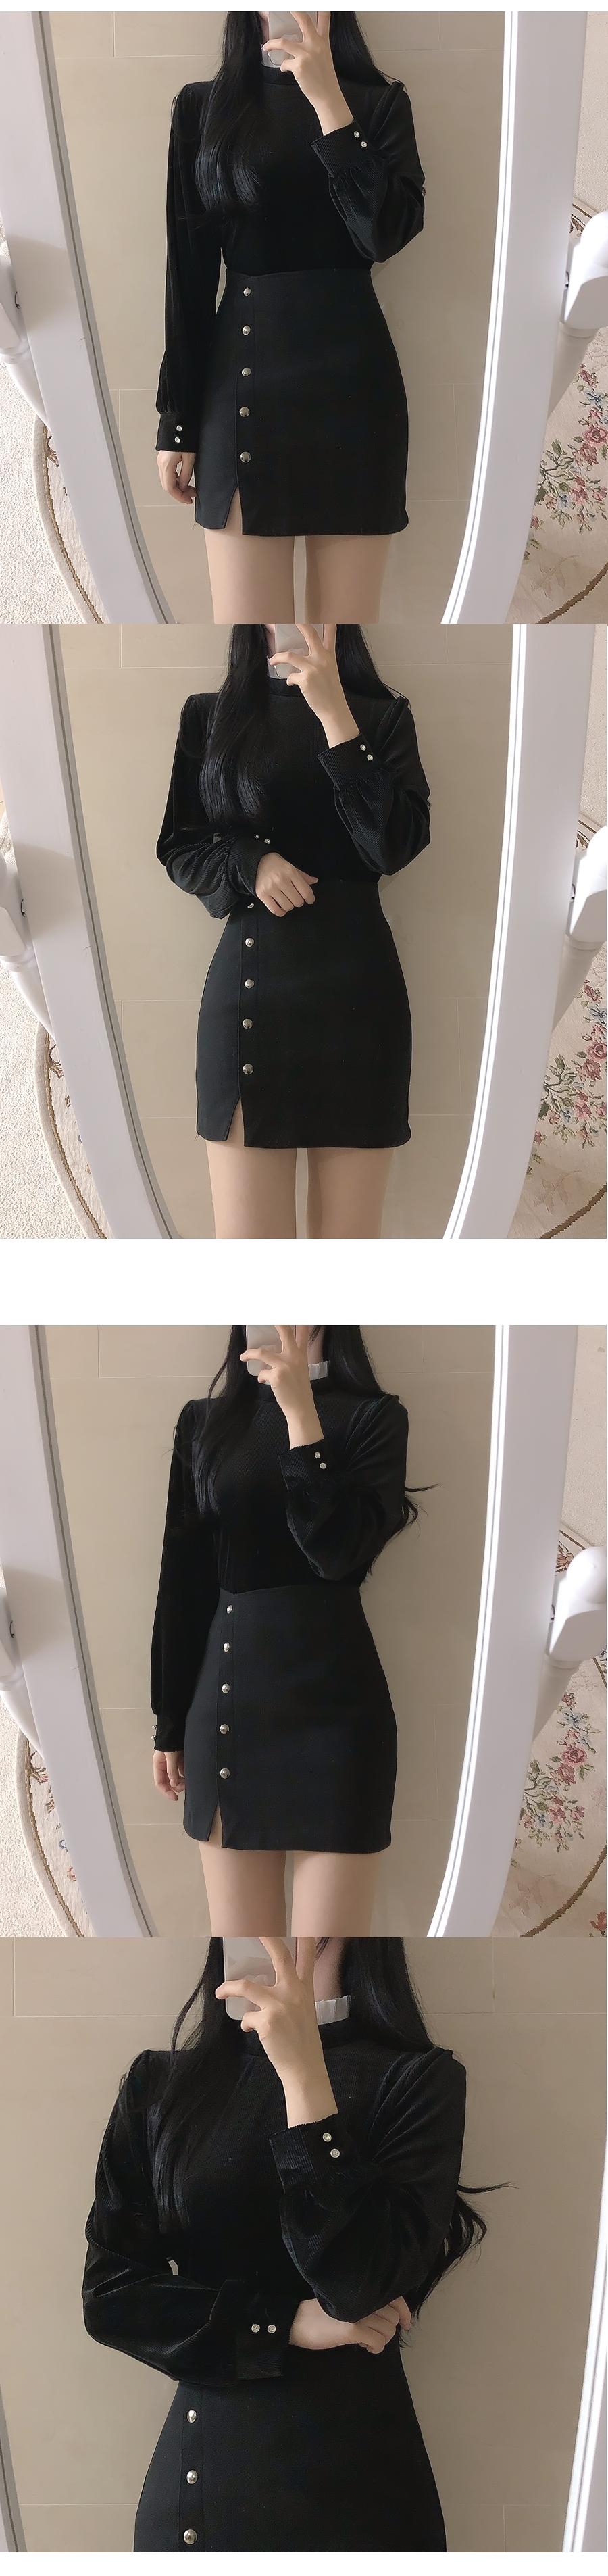 Silver button trim skirt